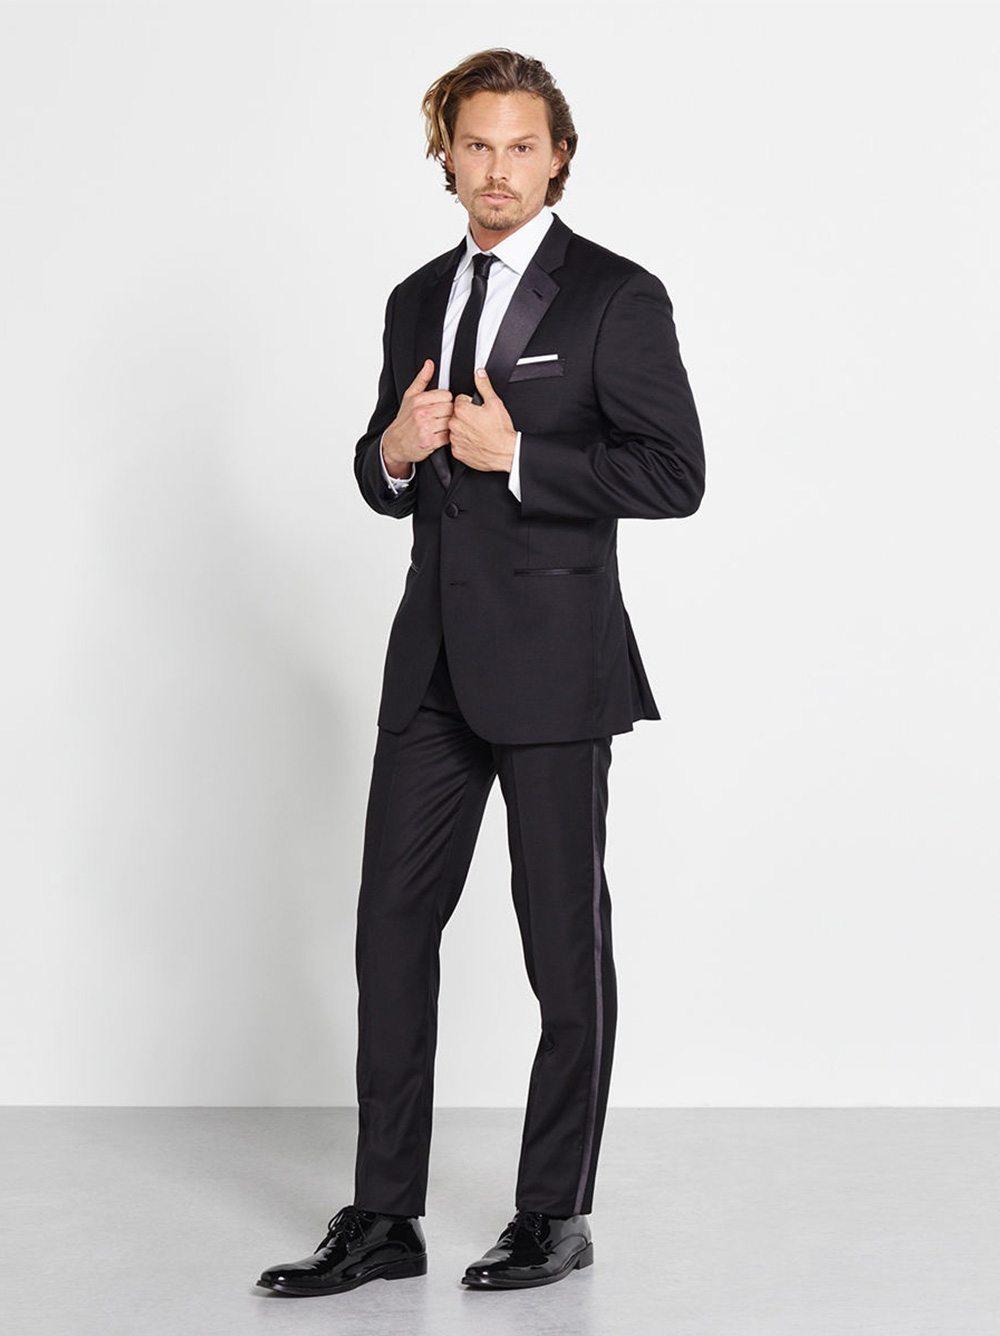 black-tie-optional-him